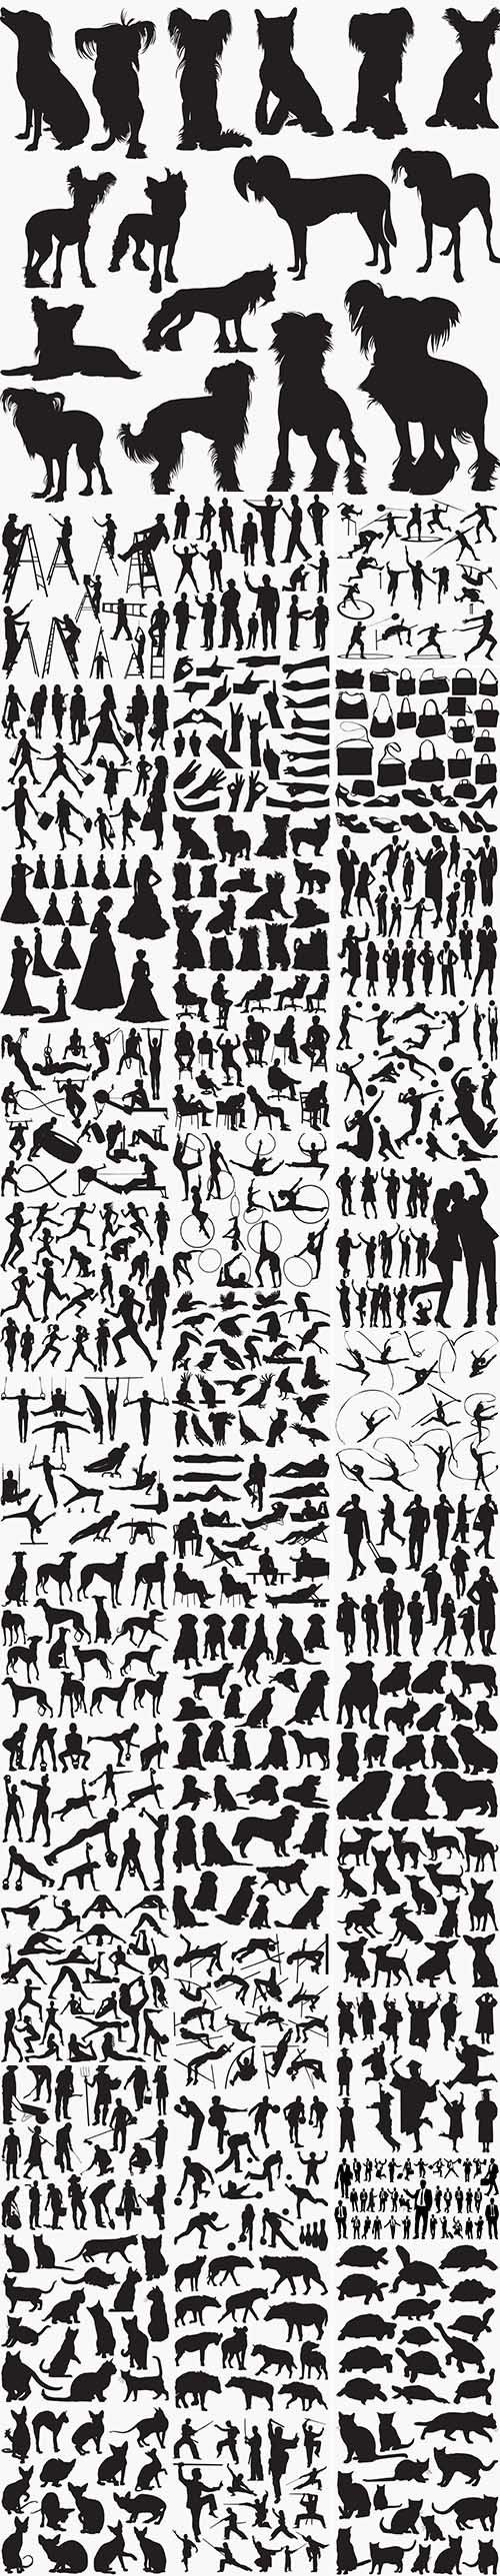 39 Set in 1 Bundle -  Black Silhouettes